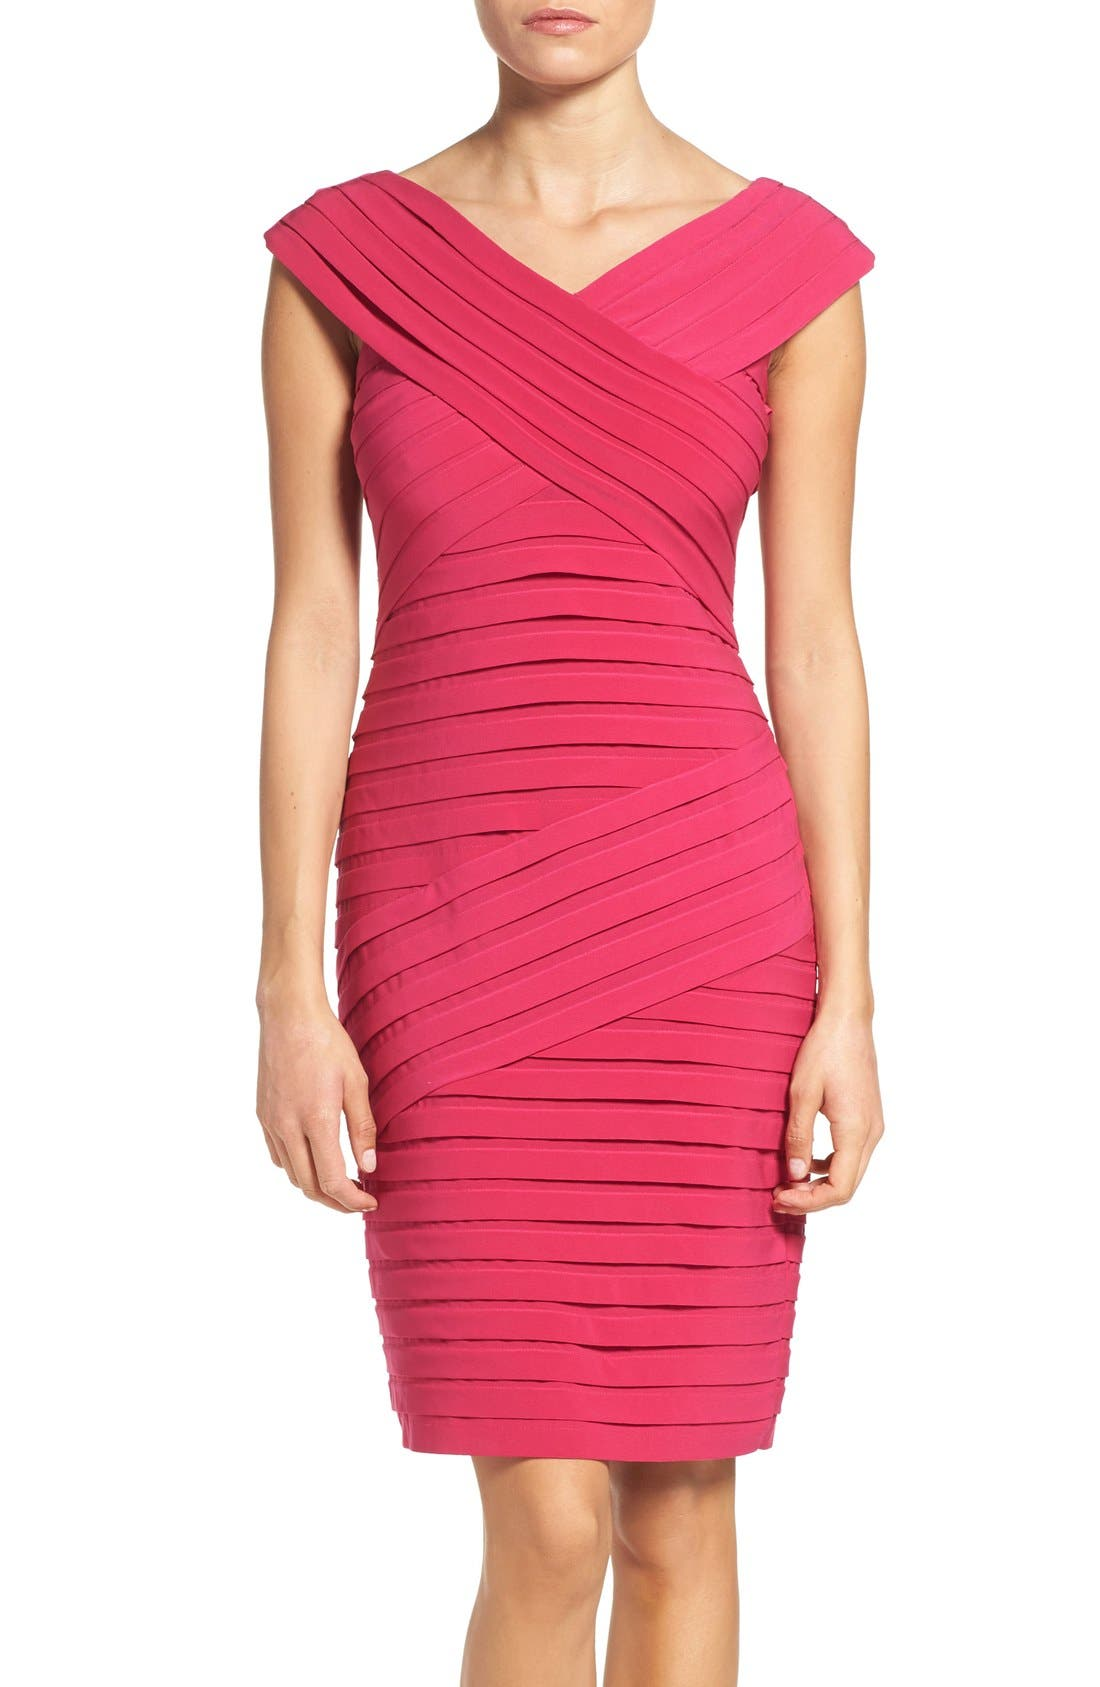 Alternate Image 1 Selected - Adrianna Papell Shutter Pleat Sheath Dress